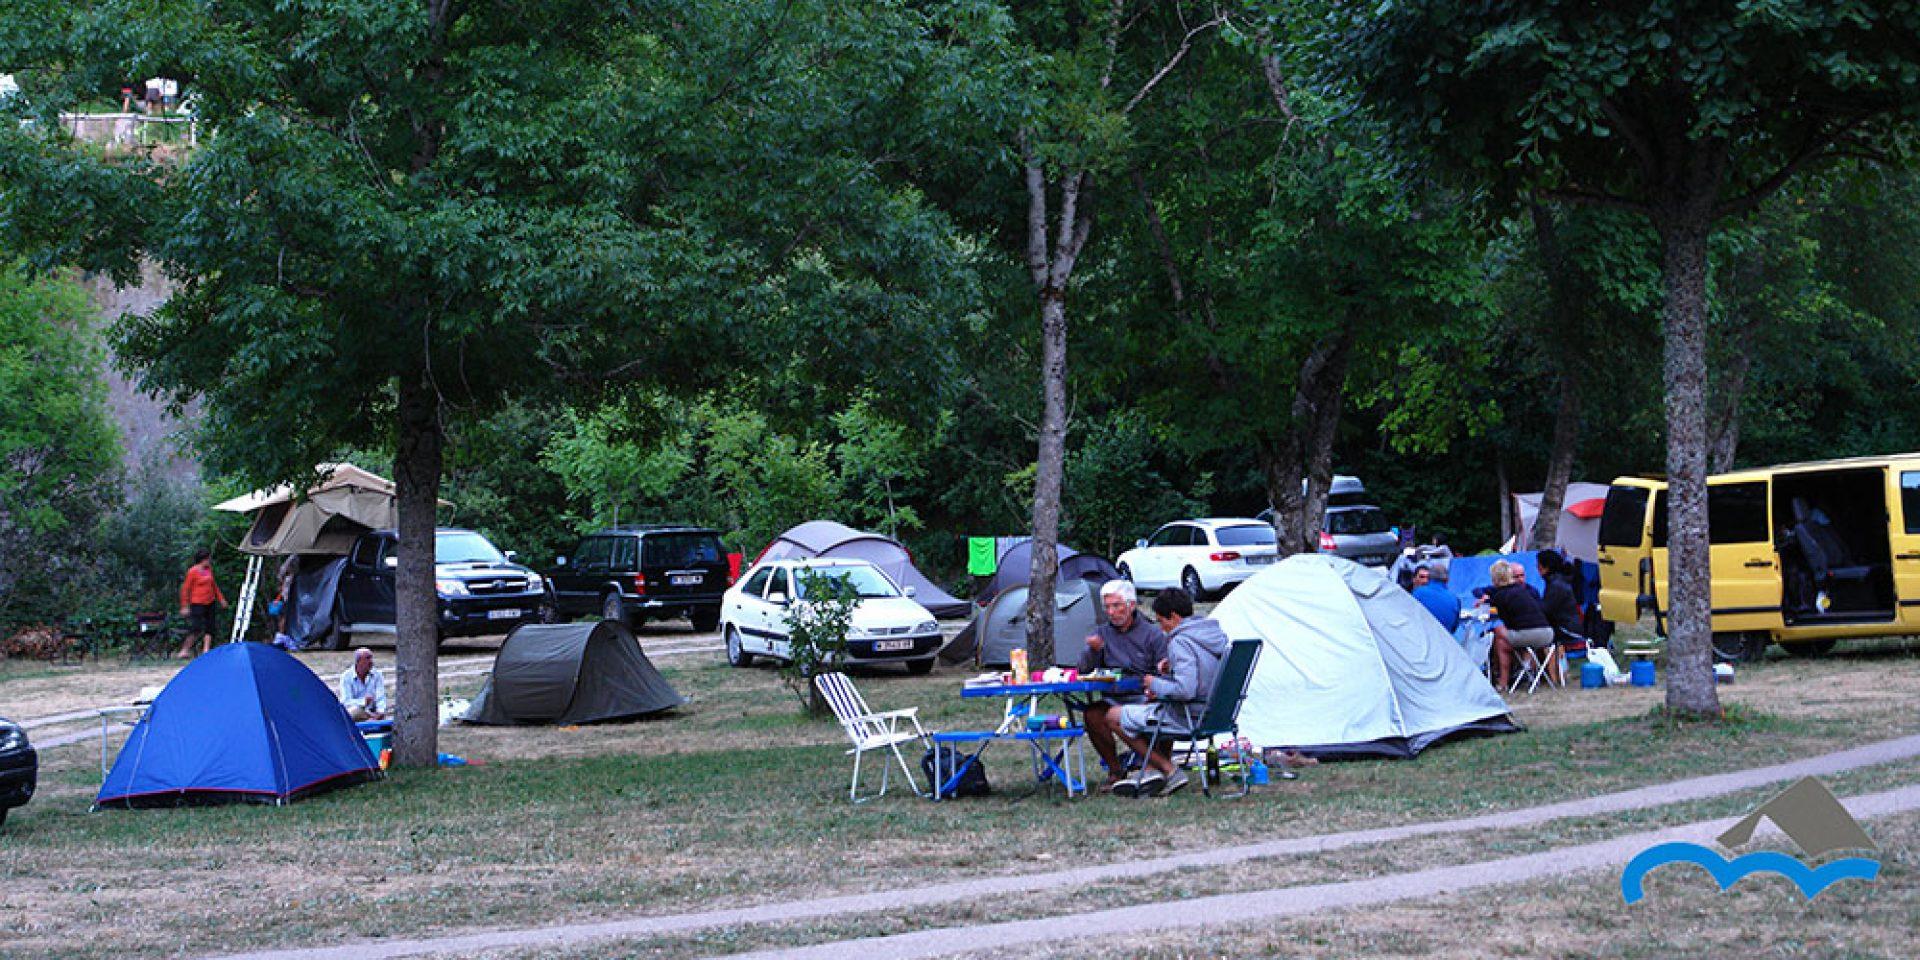 acampada sin parcelar